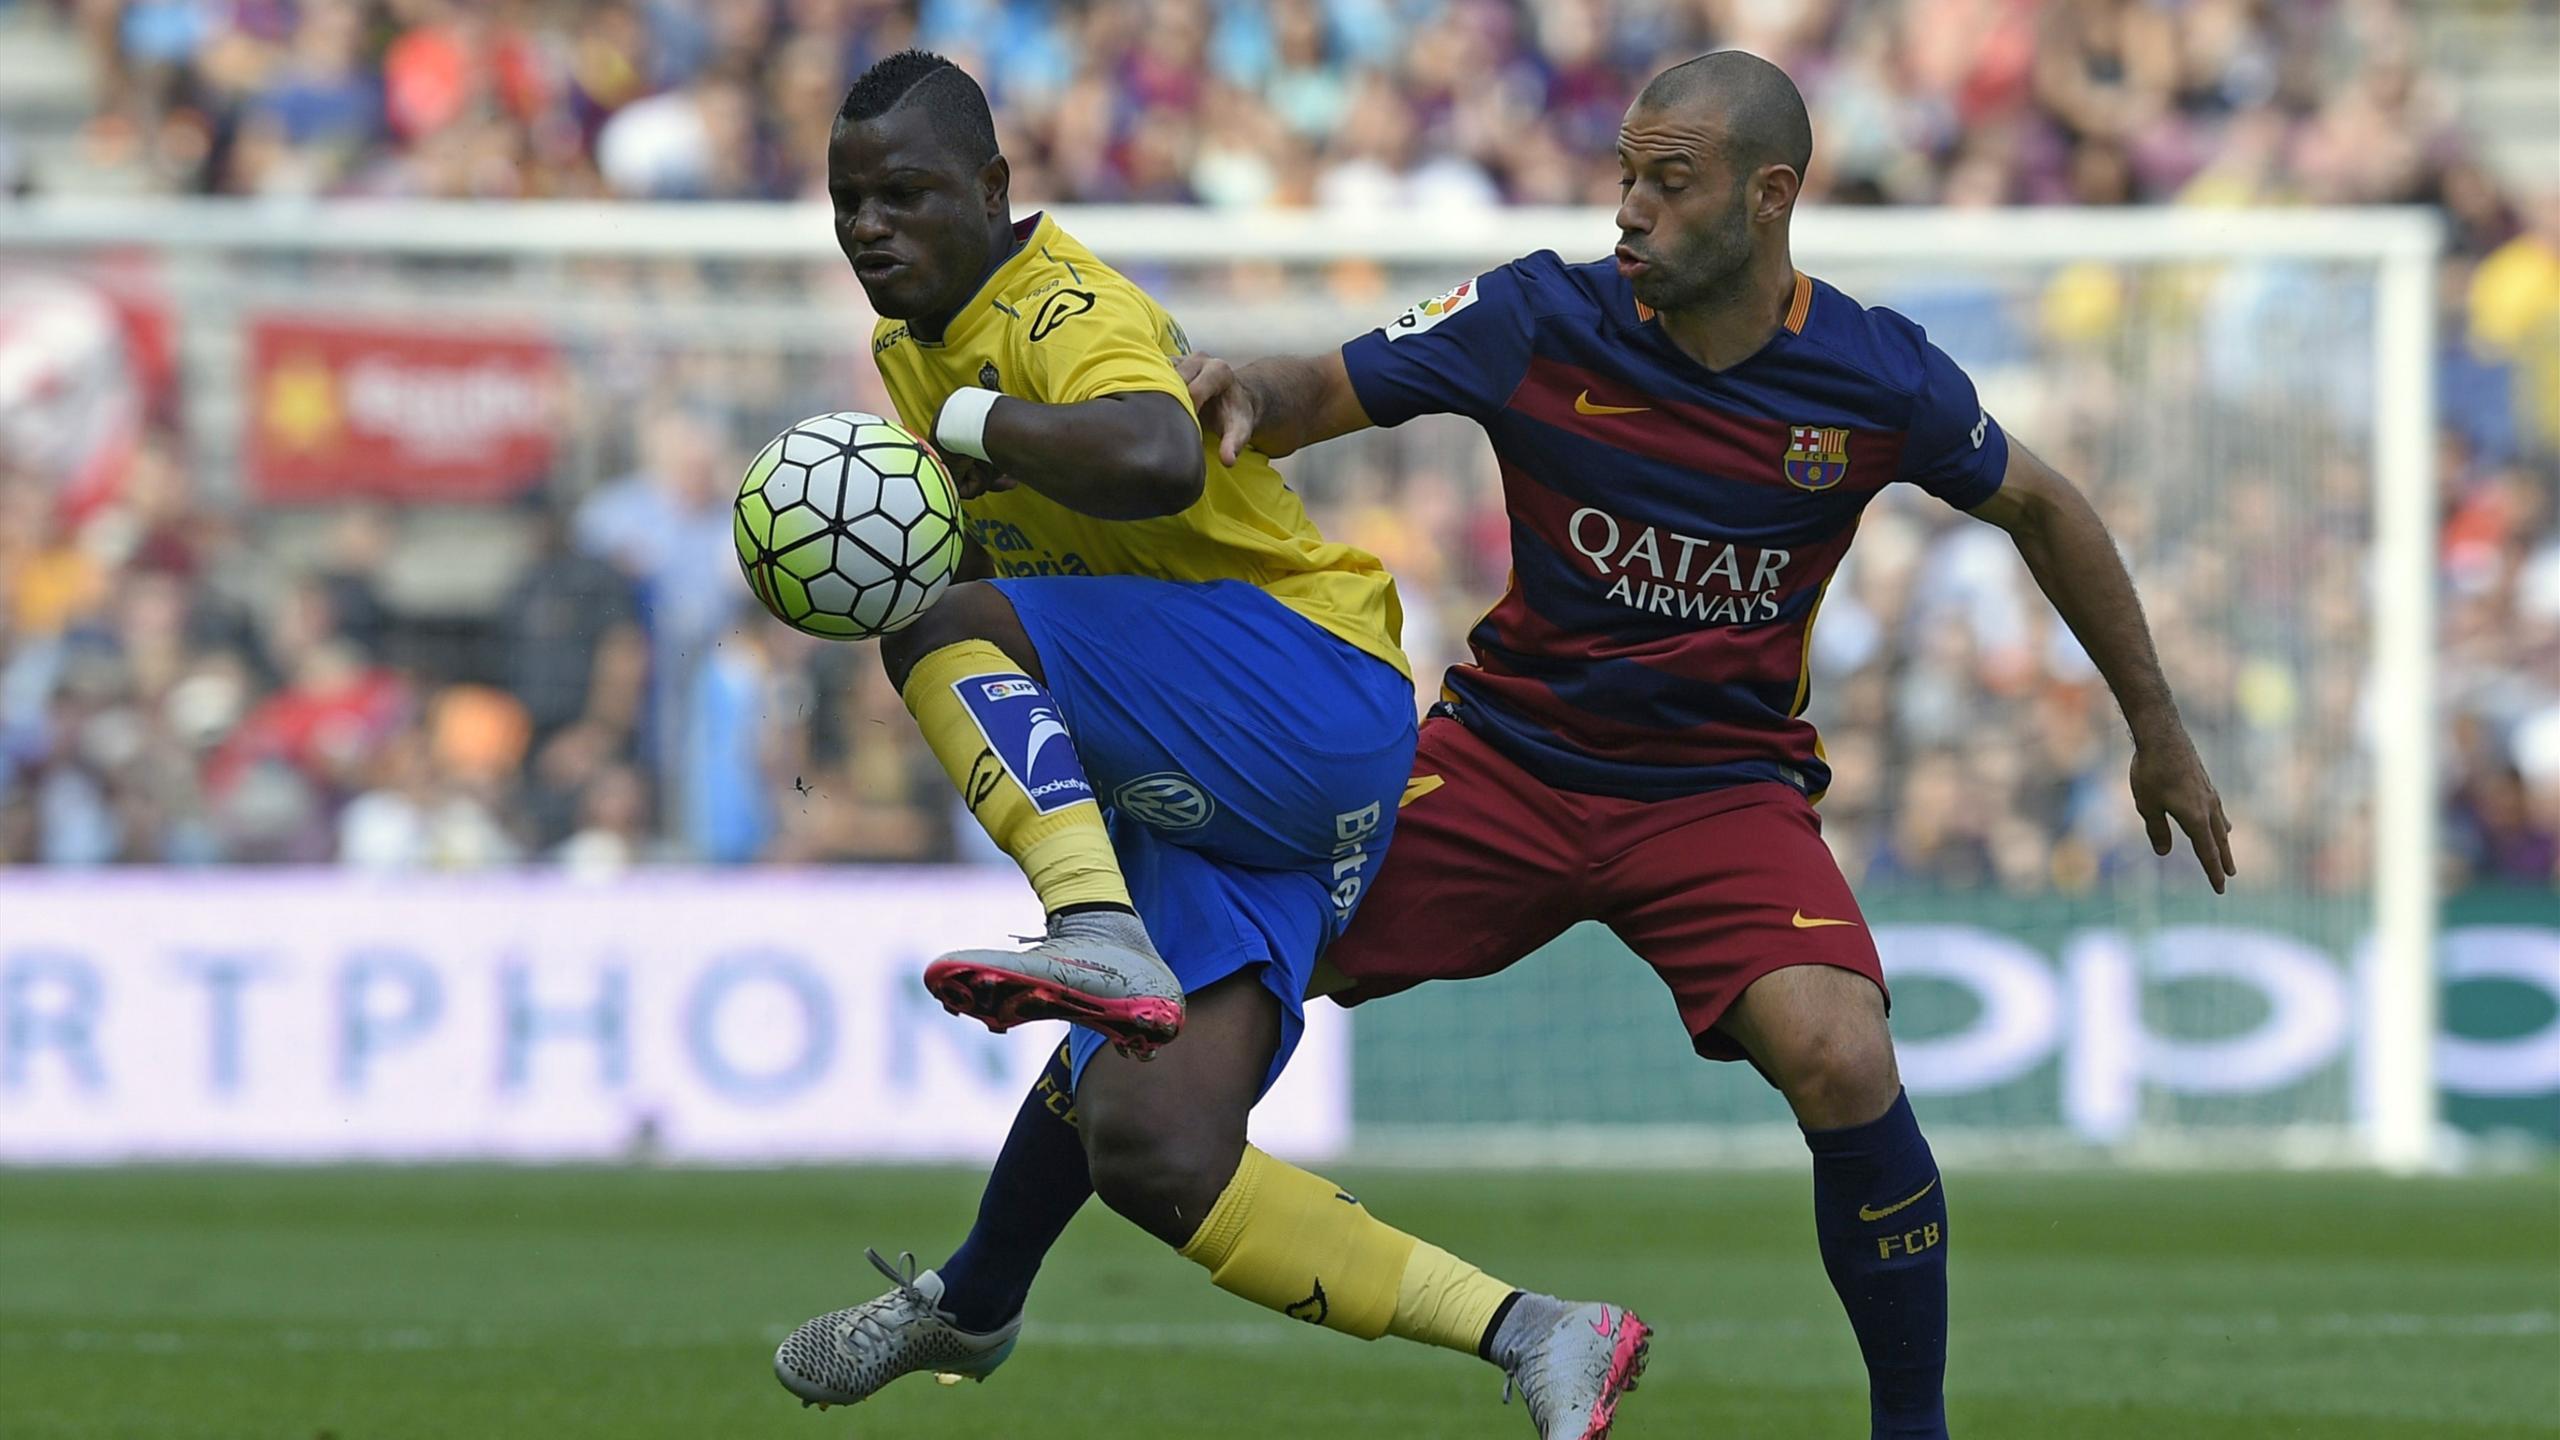 Javier Mascherano au duel avec Wakaso lors de Barça-Las Palmas